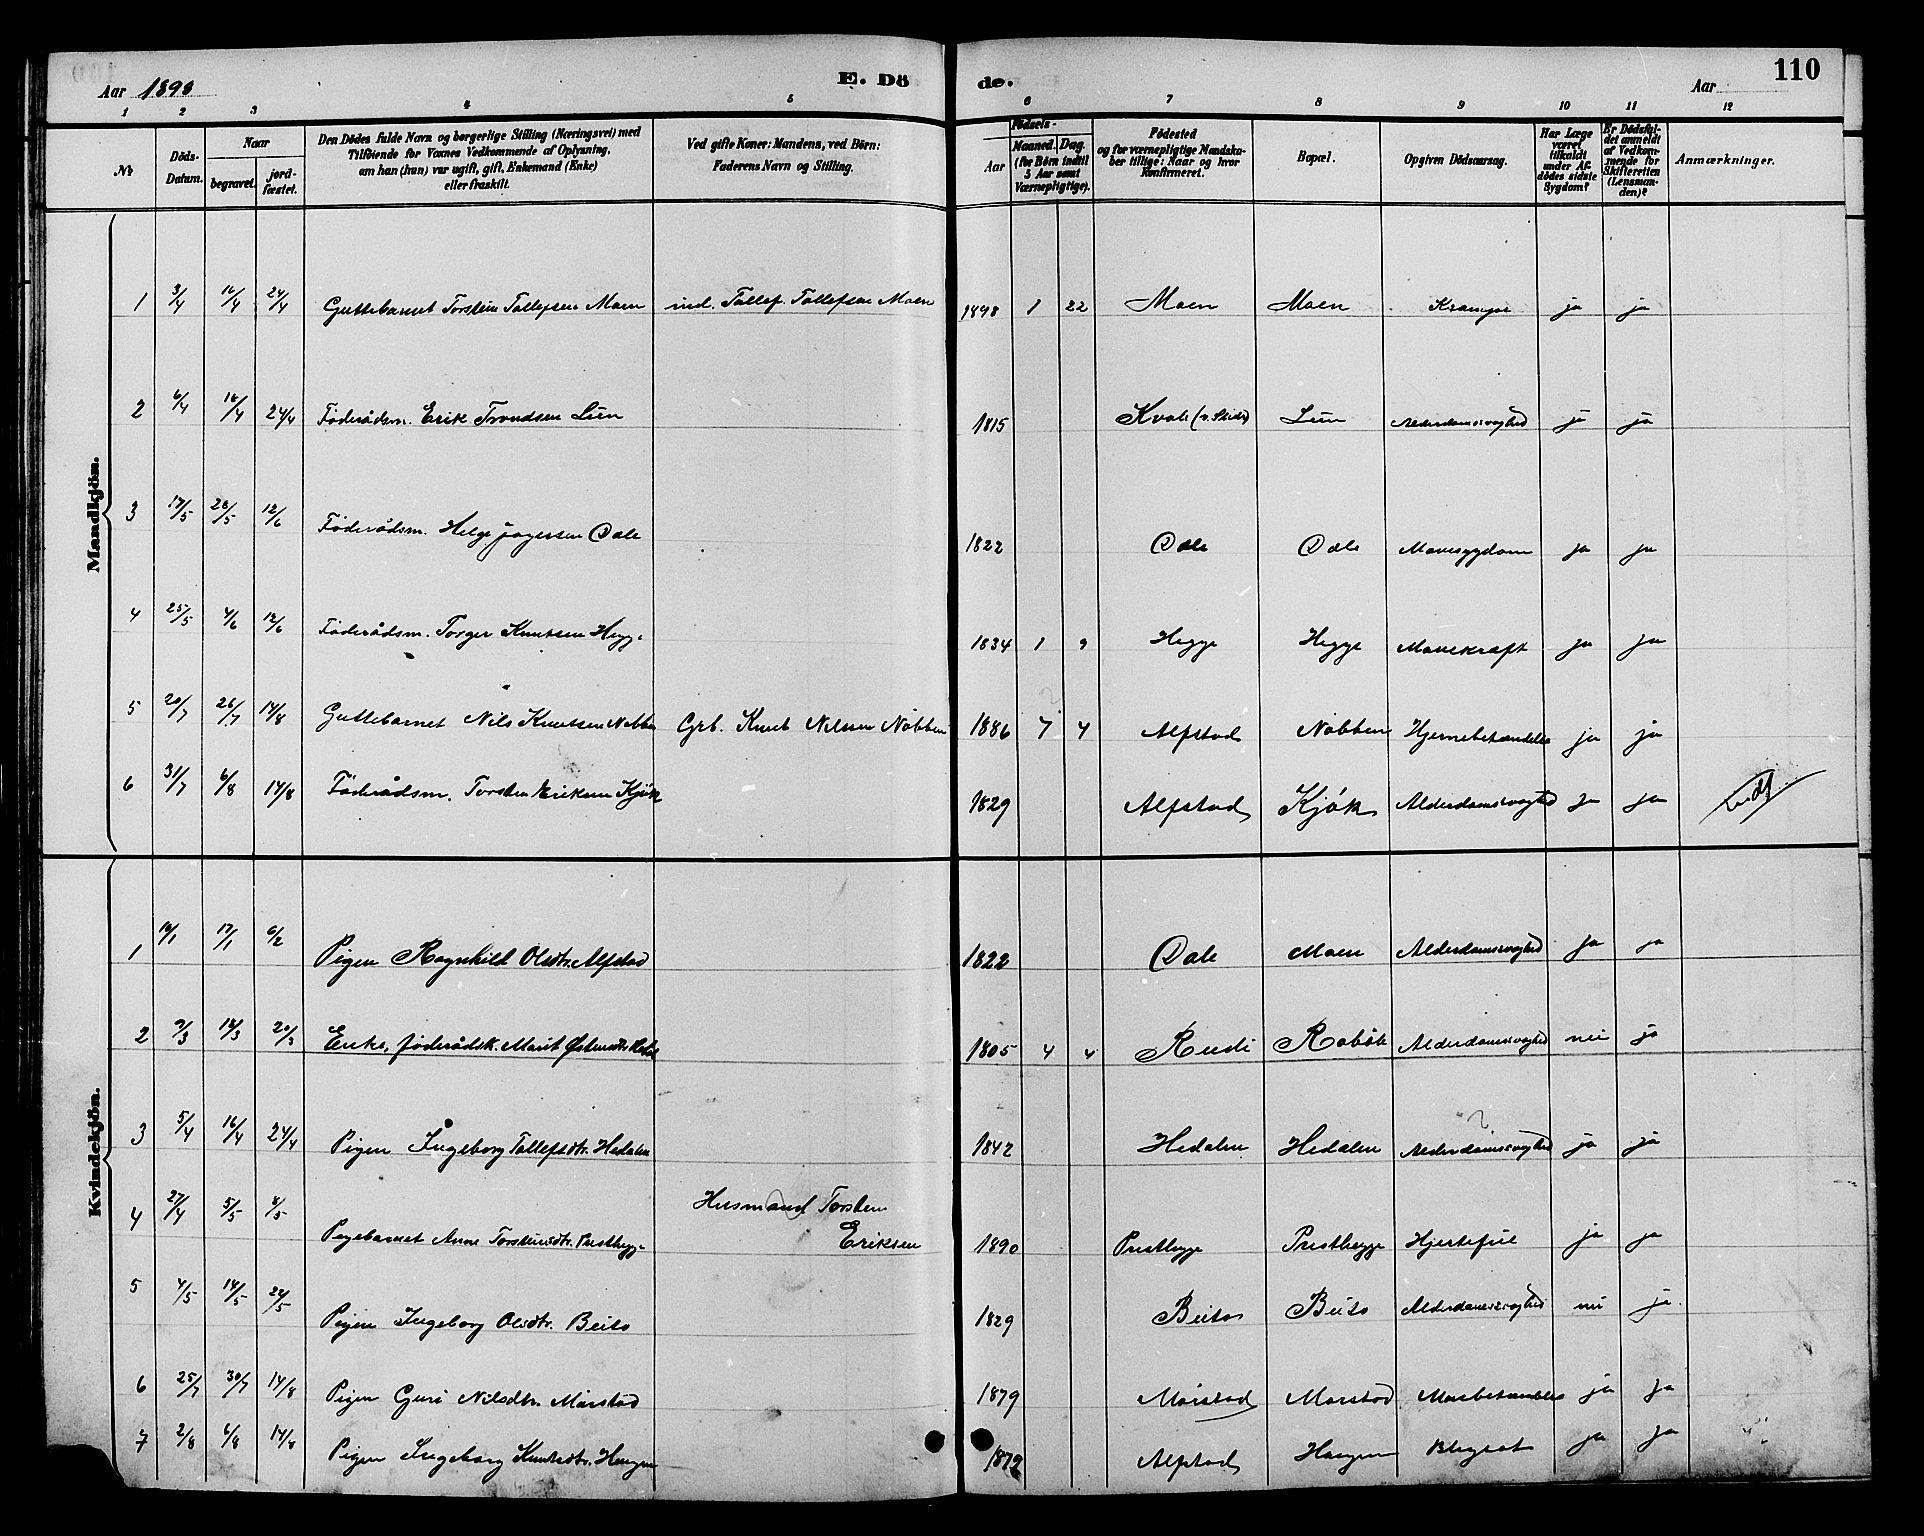 SAH, Øystre Slidre prestekontor, Klokkerbok nr. 4, 1887-1907, s. 110